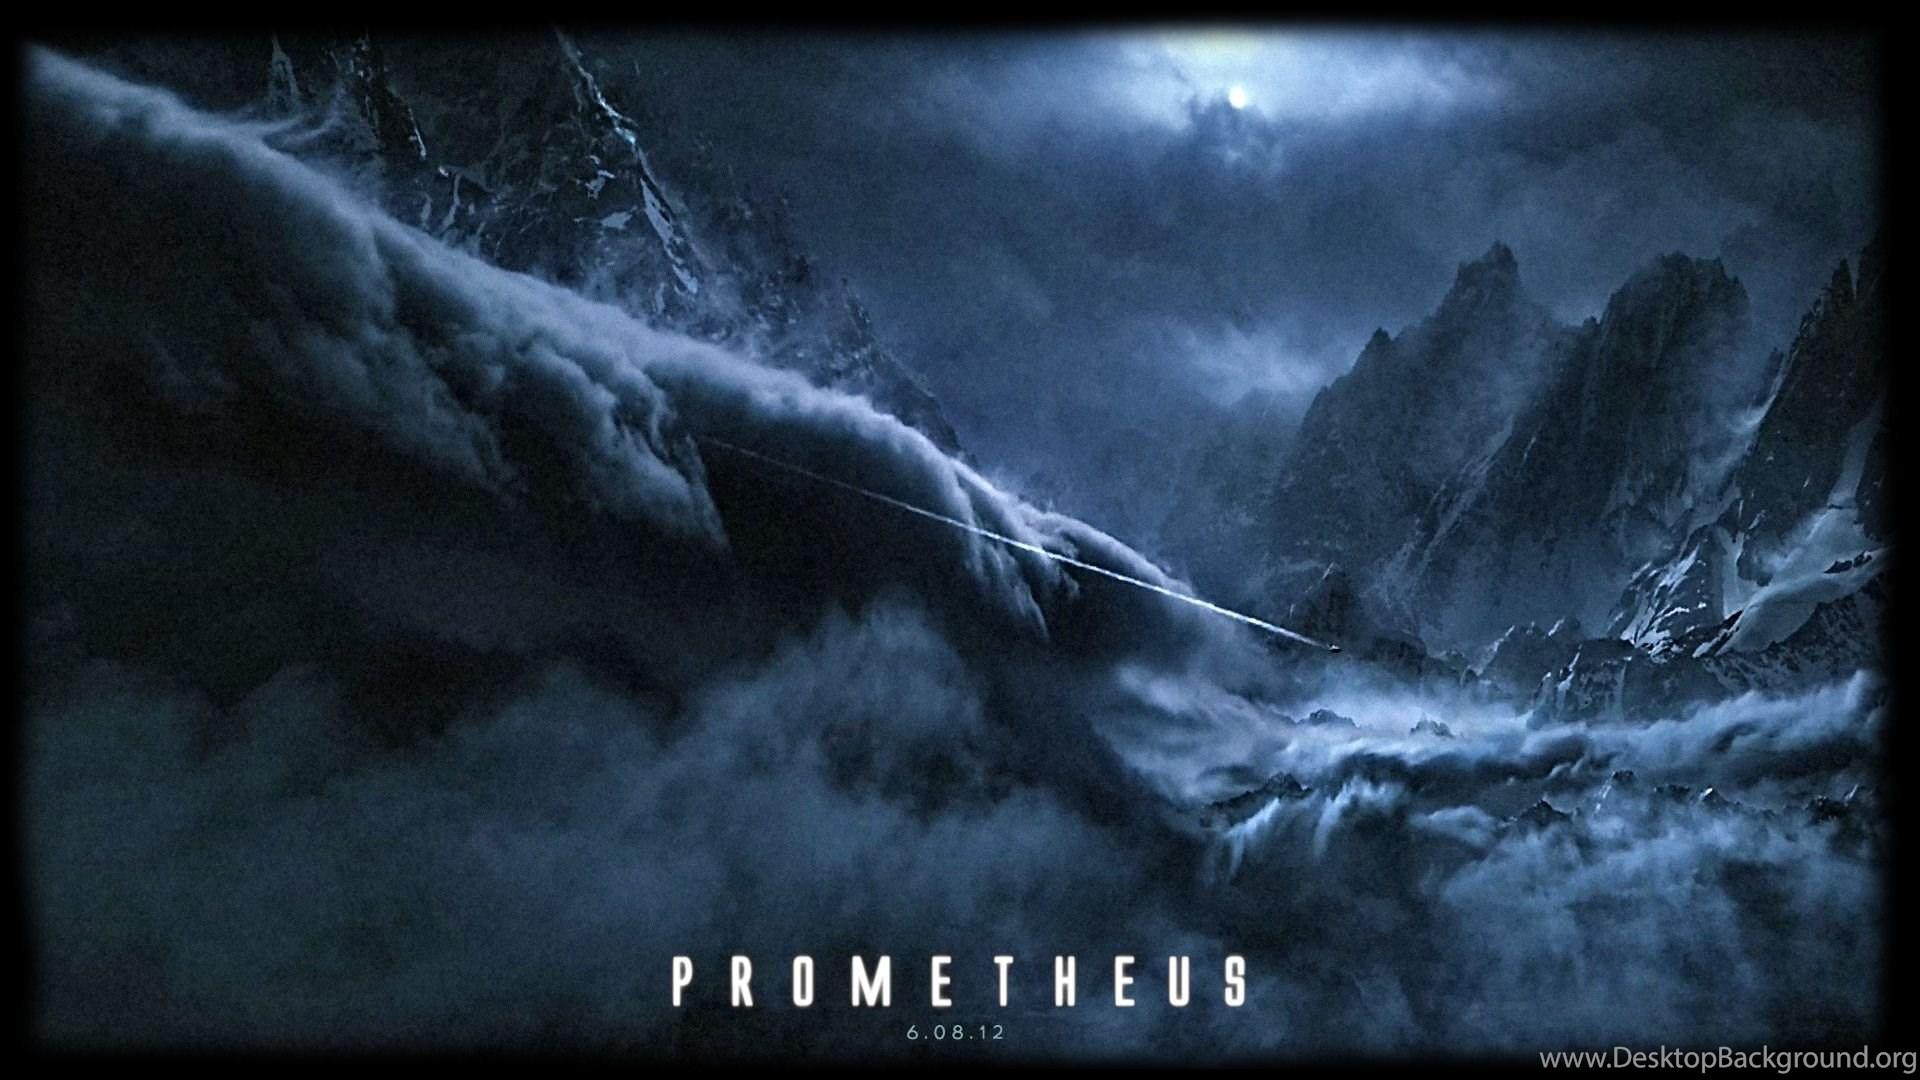 prometheus movie free download